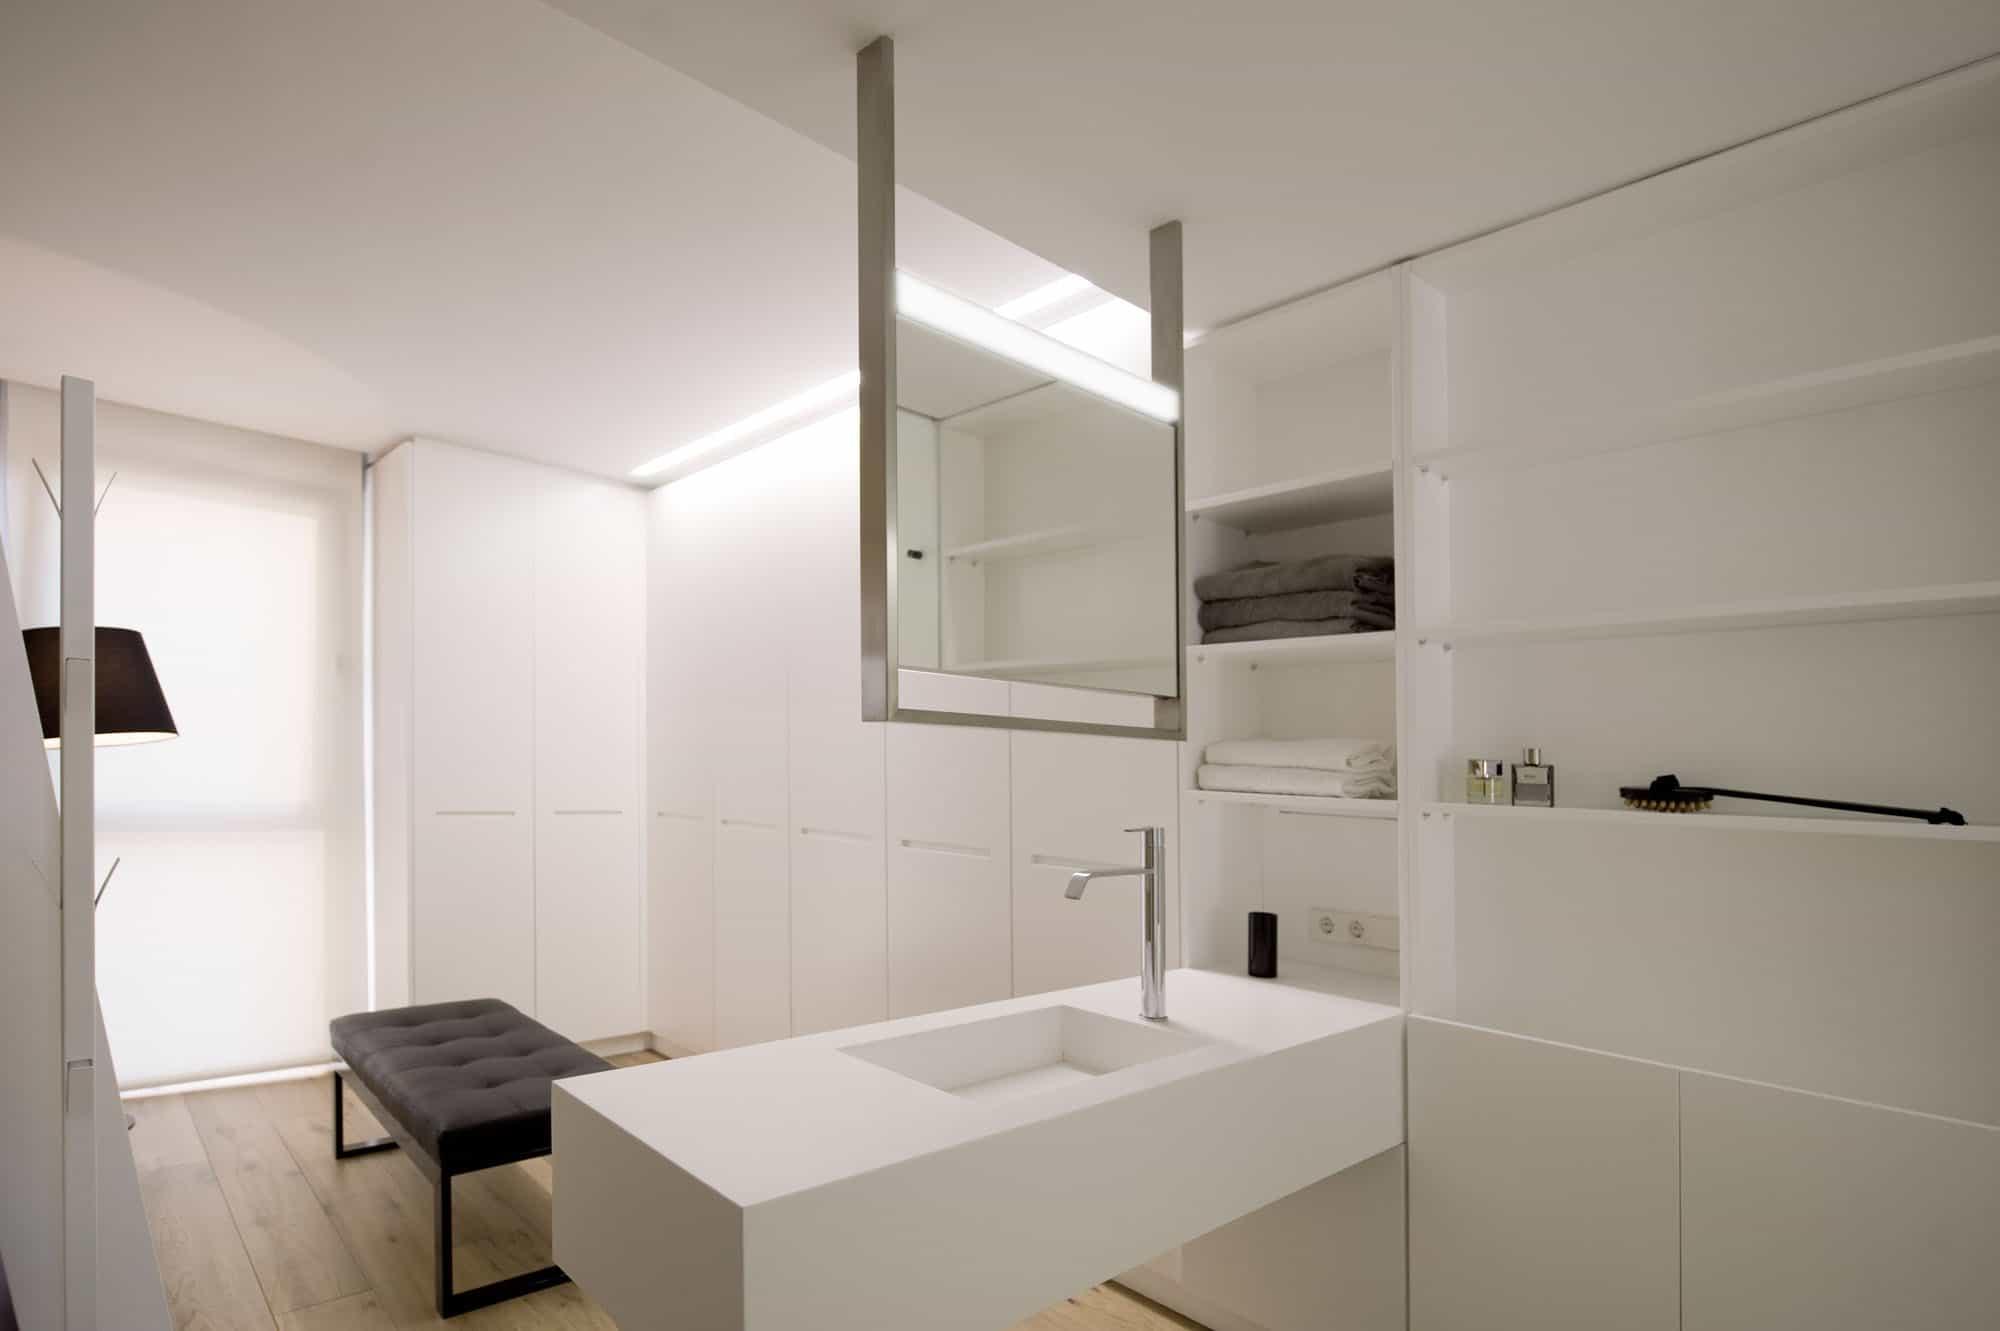 HI-MACS Doble Dueto Apartment by Cuartopensante (30)